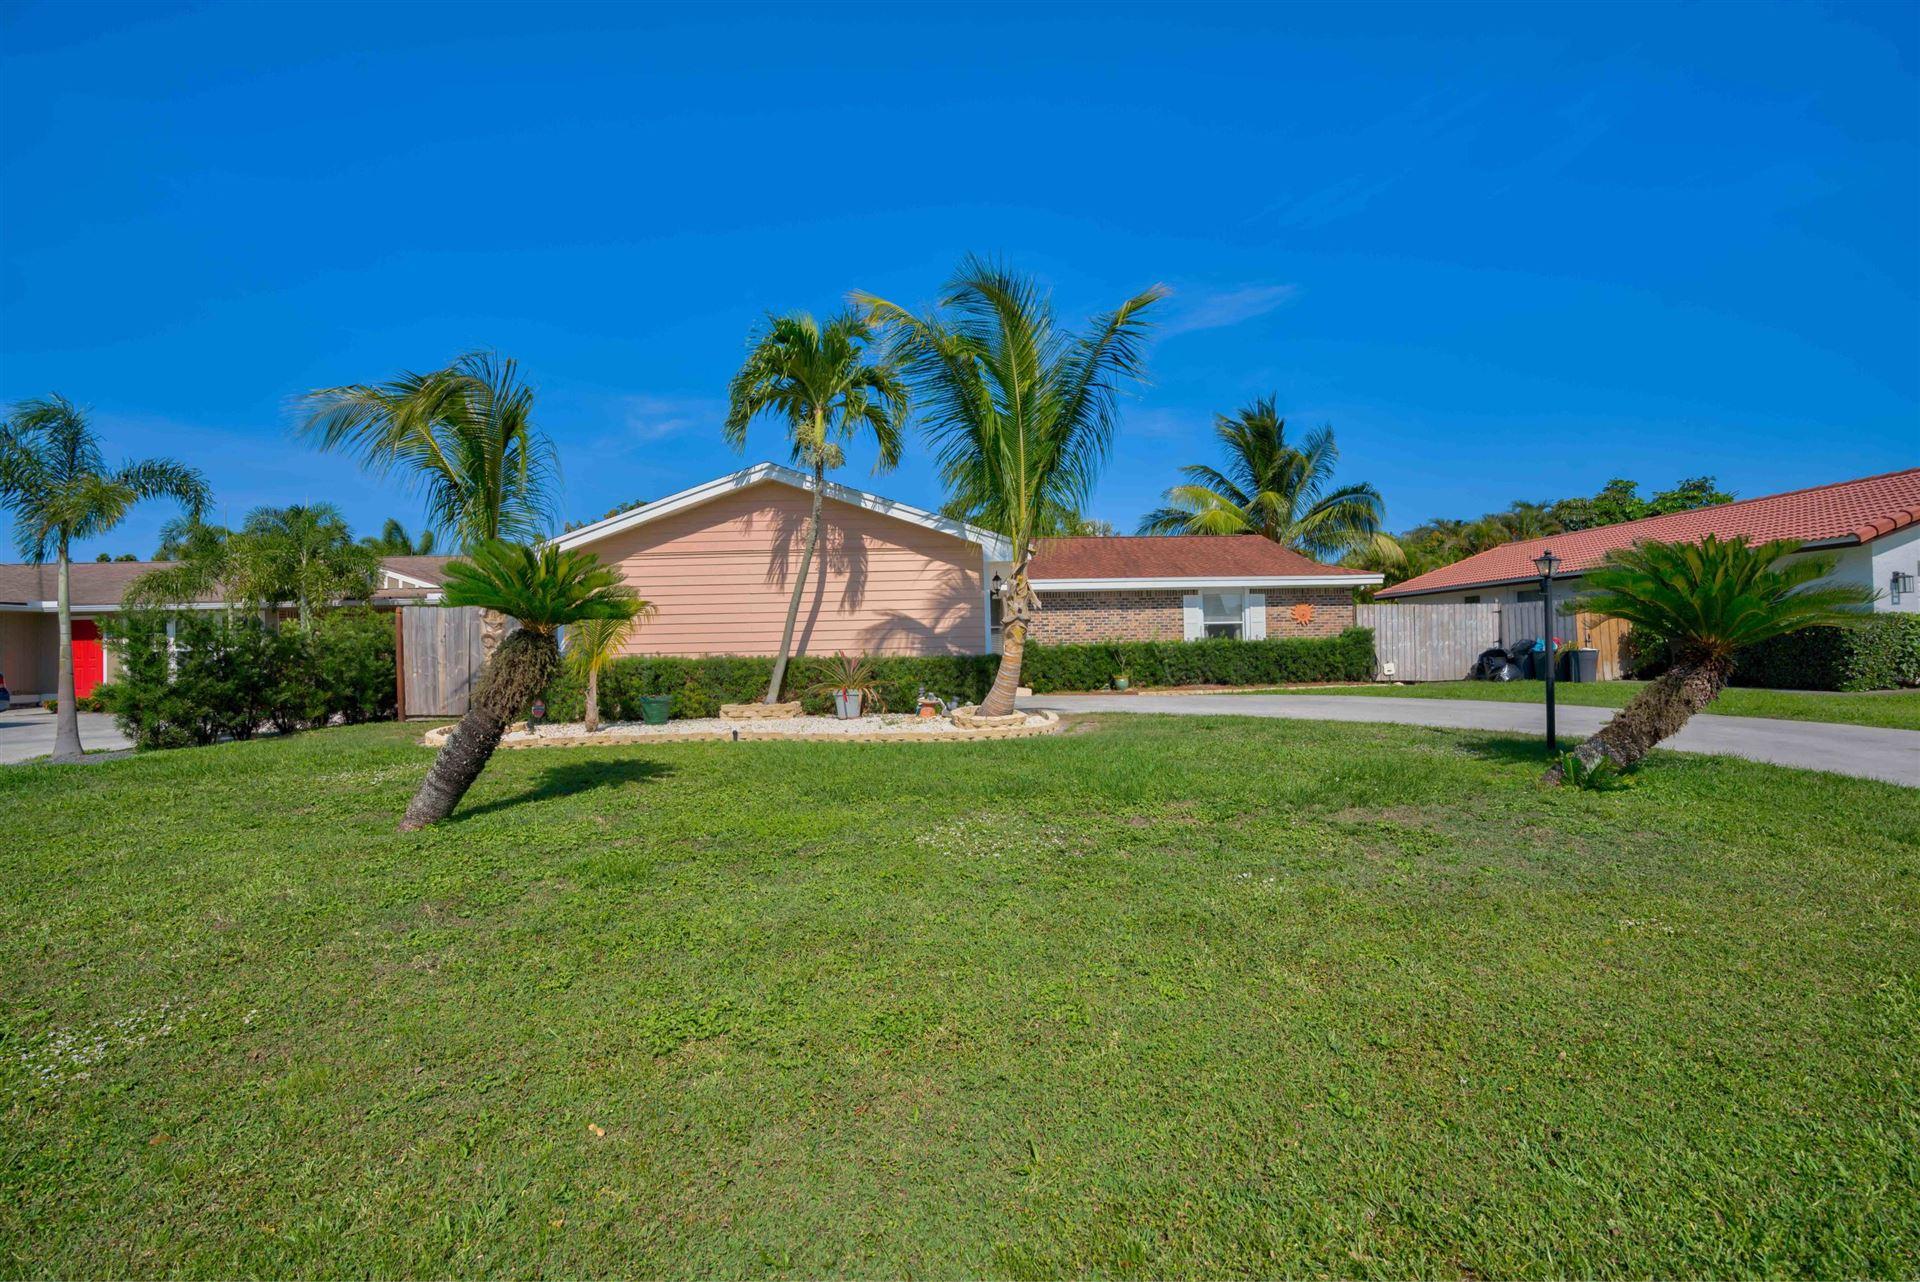 11620 Ficus Street, Palm Beach Gardens, FL 33410 - #: RX-10713822